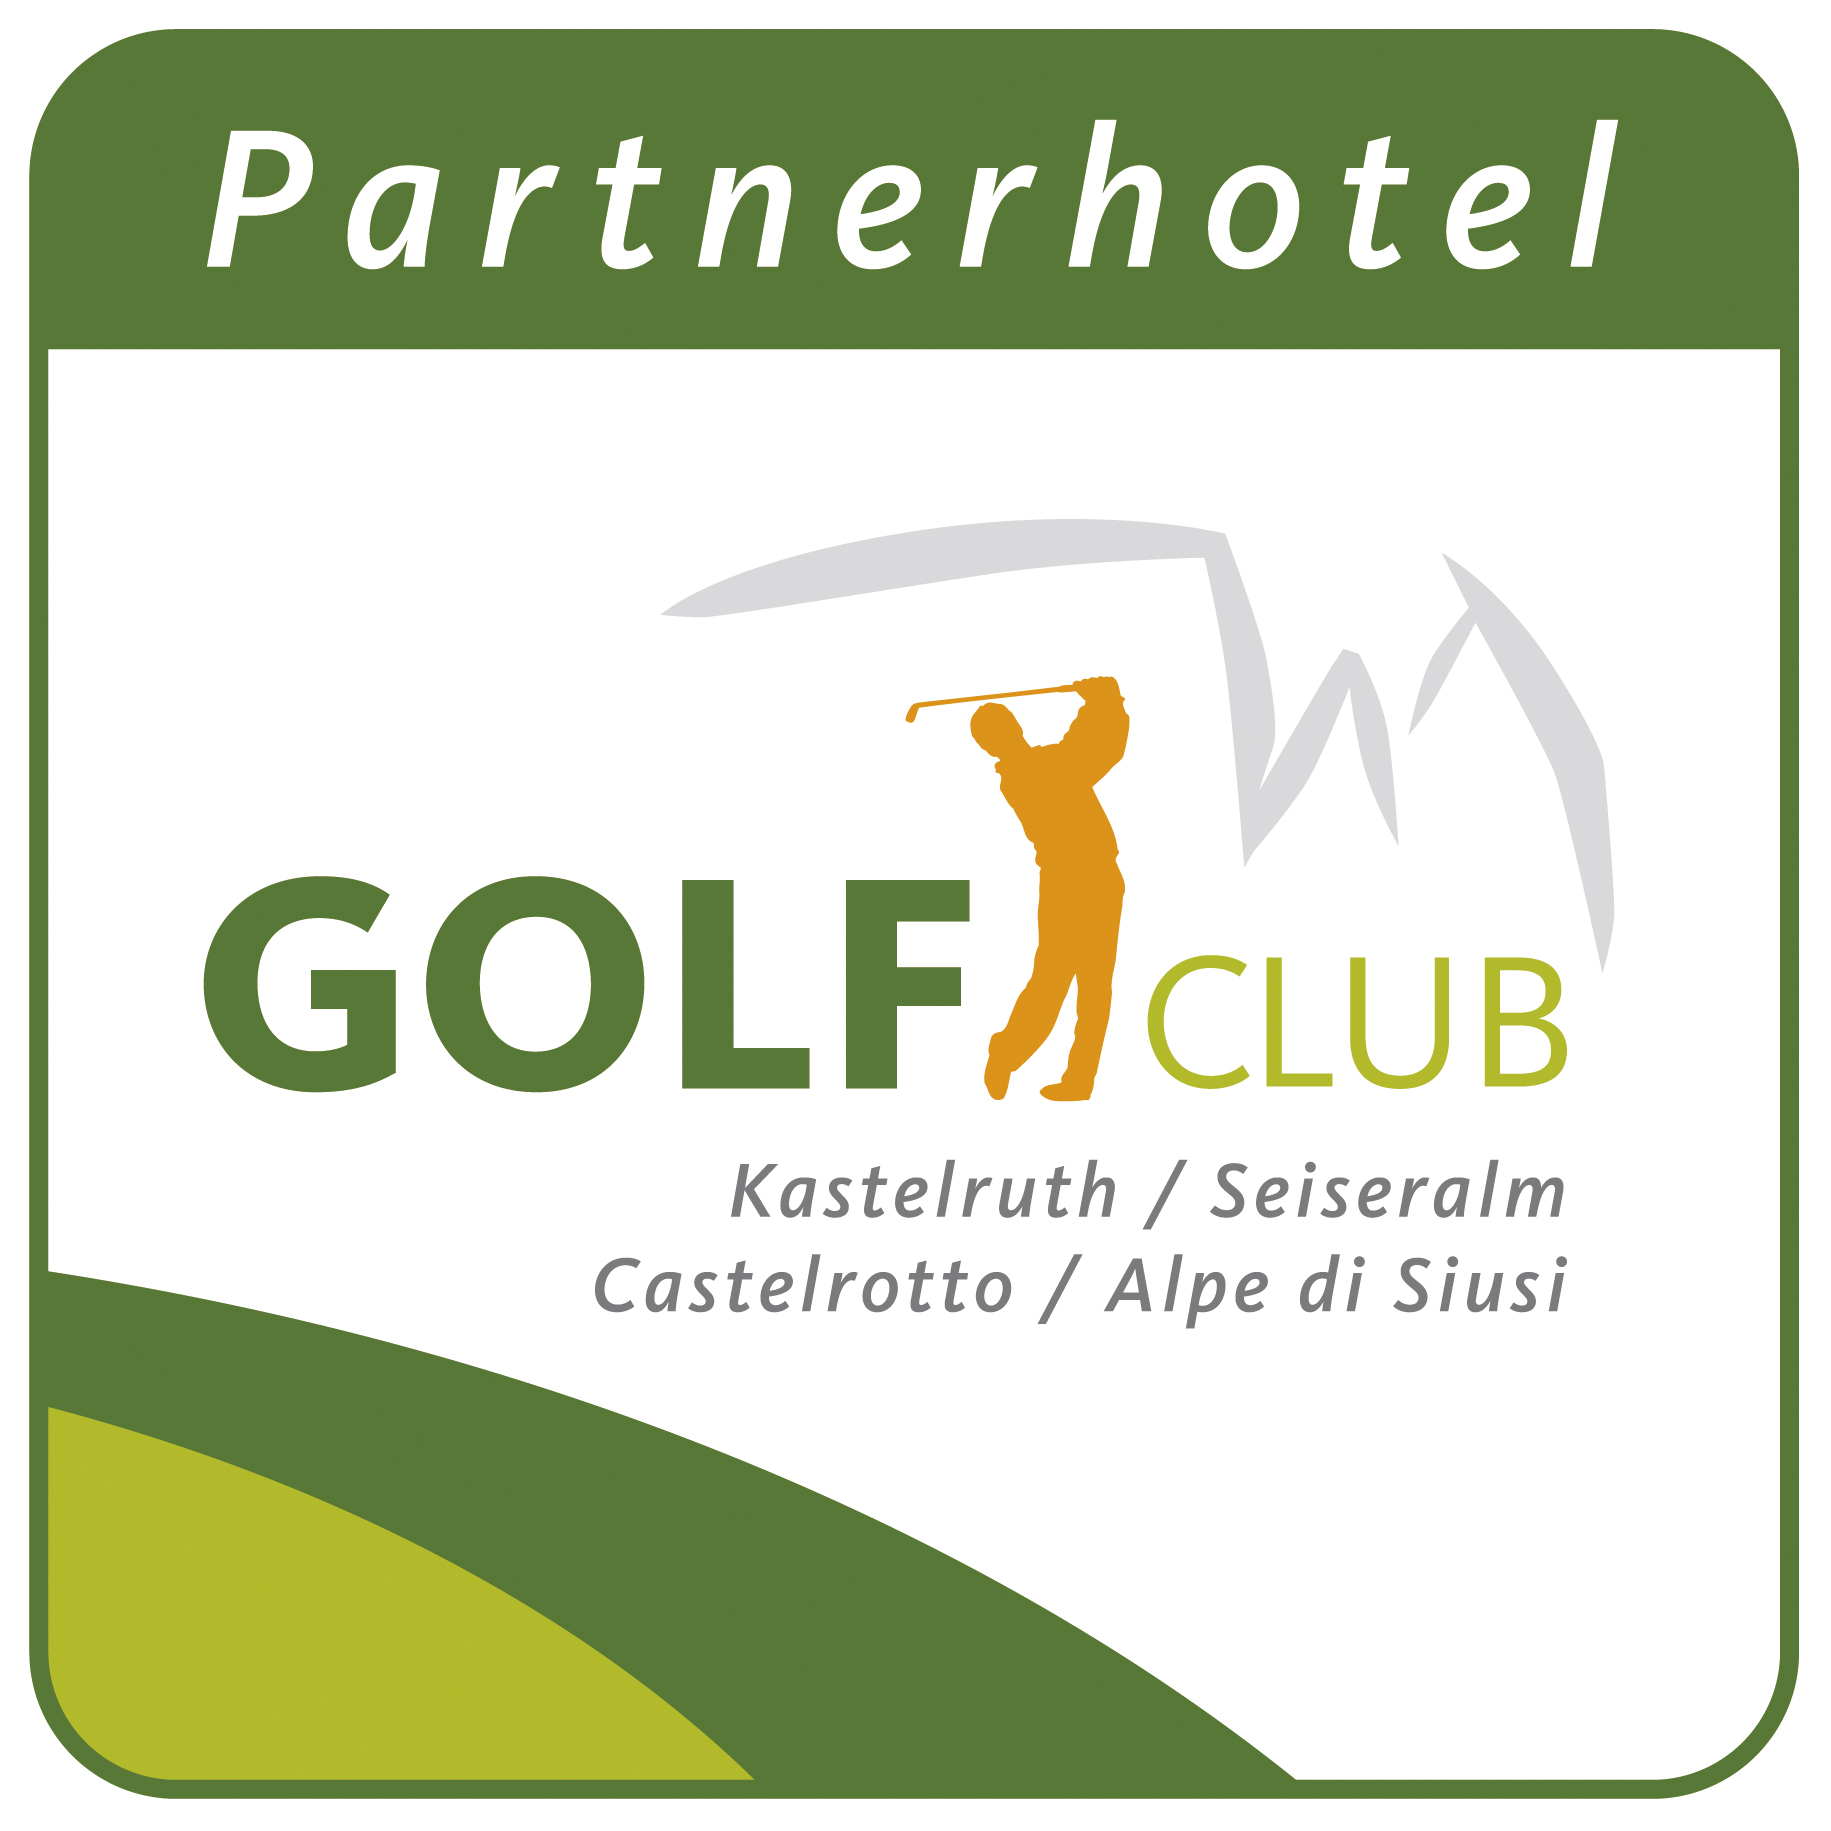 gck_logo_partnerhotel_rgb1